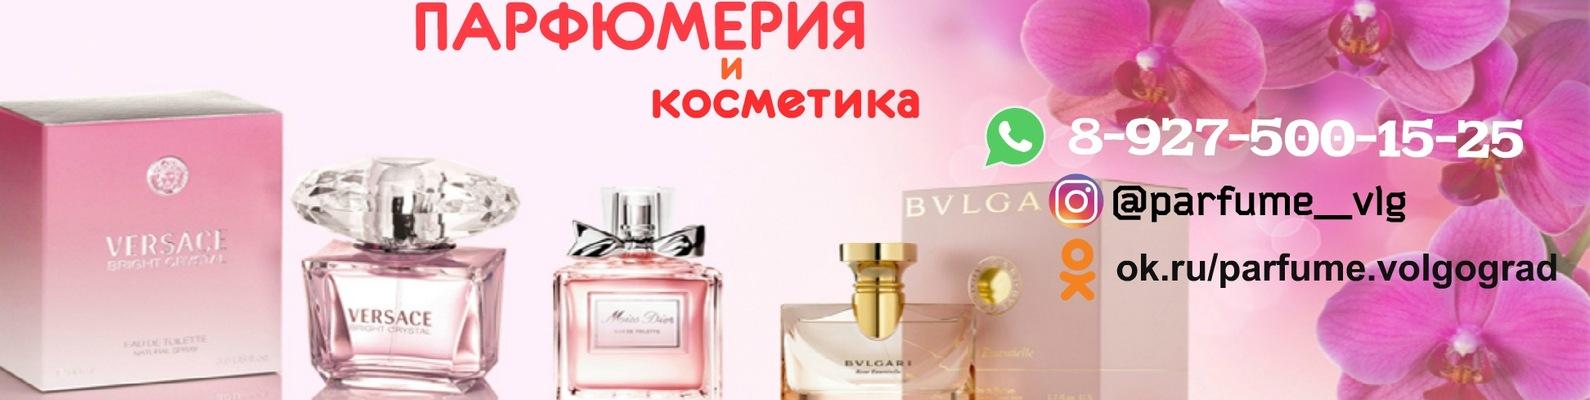 парфюм волгоград вконтакте